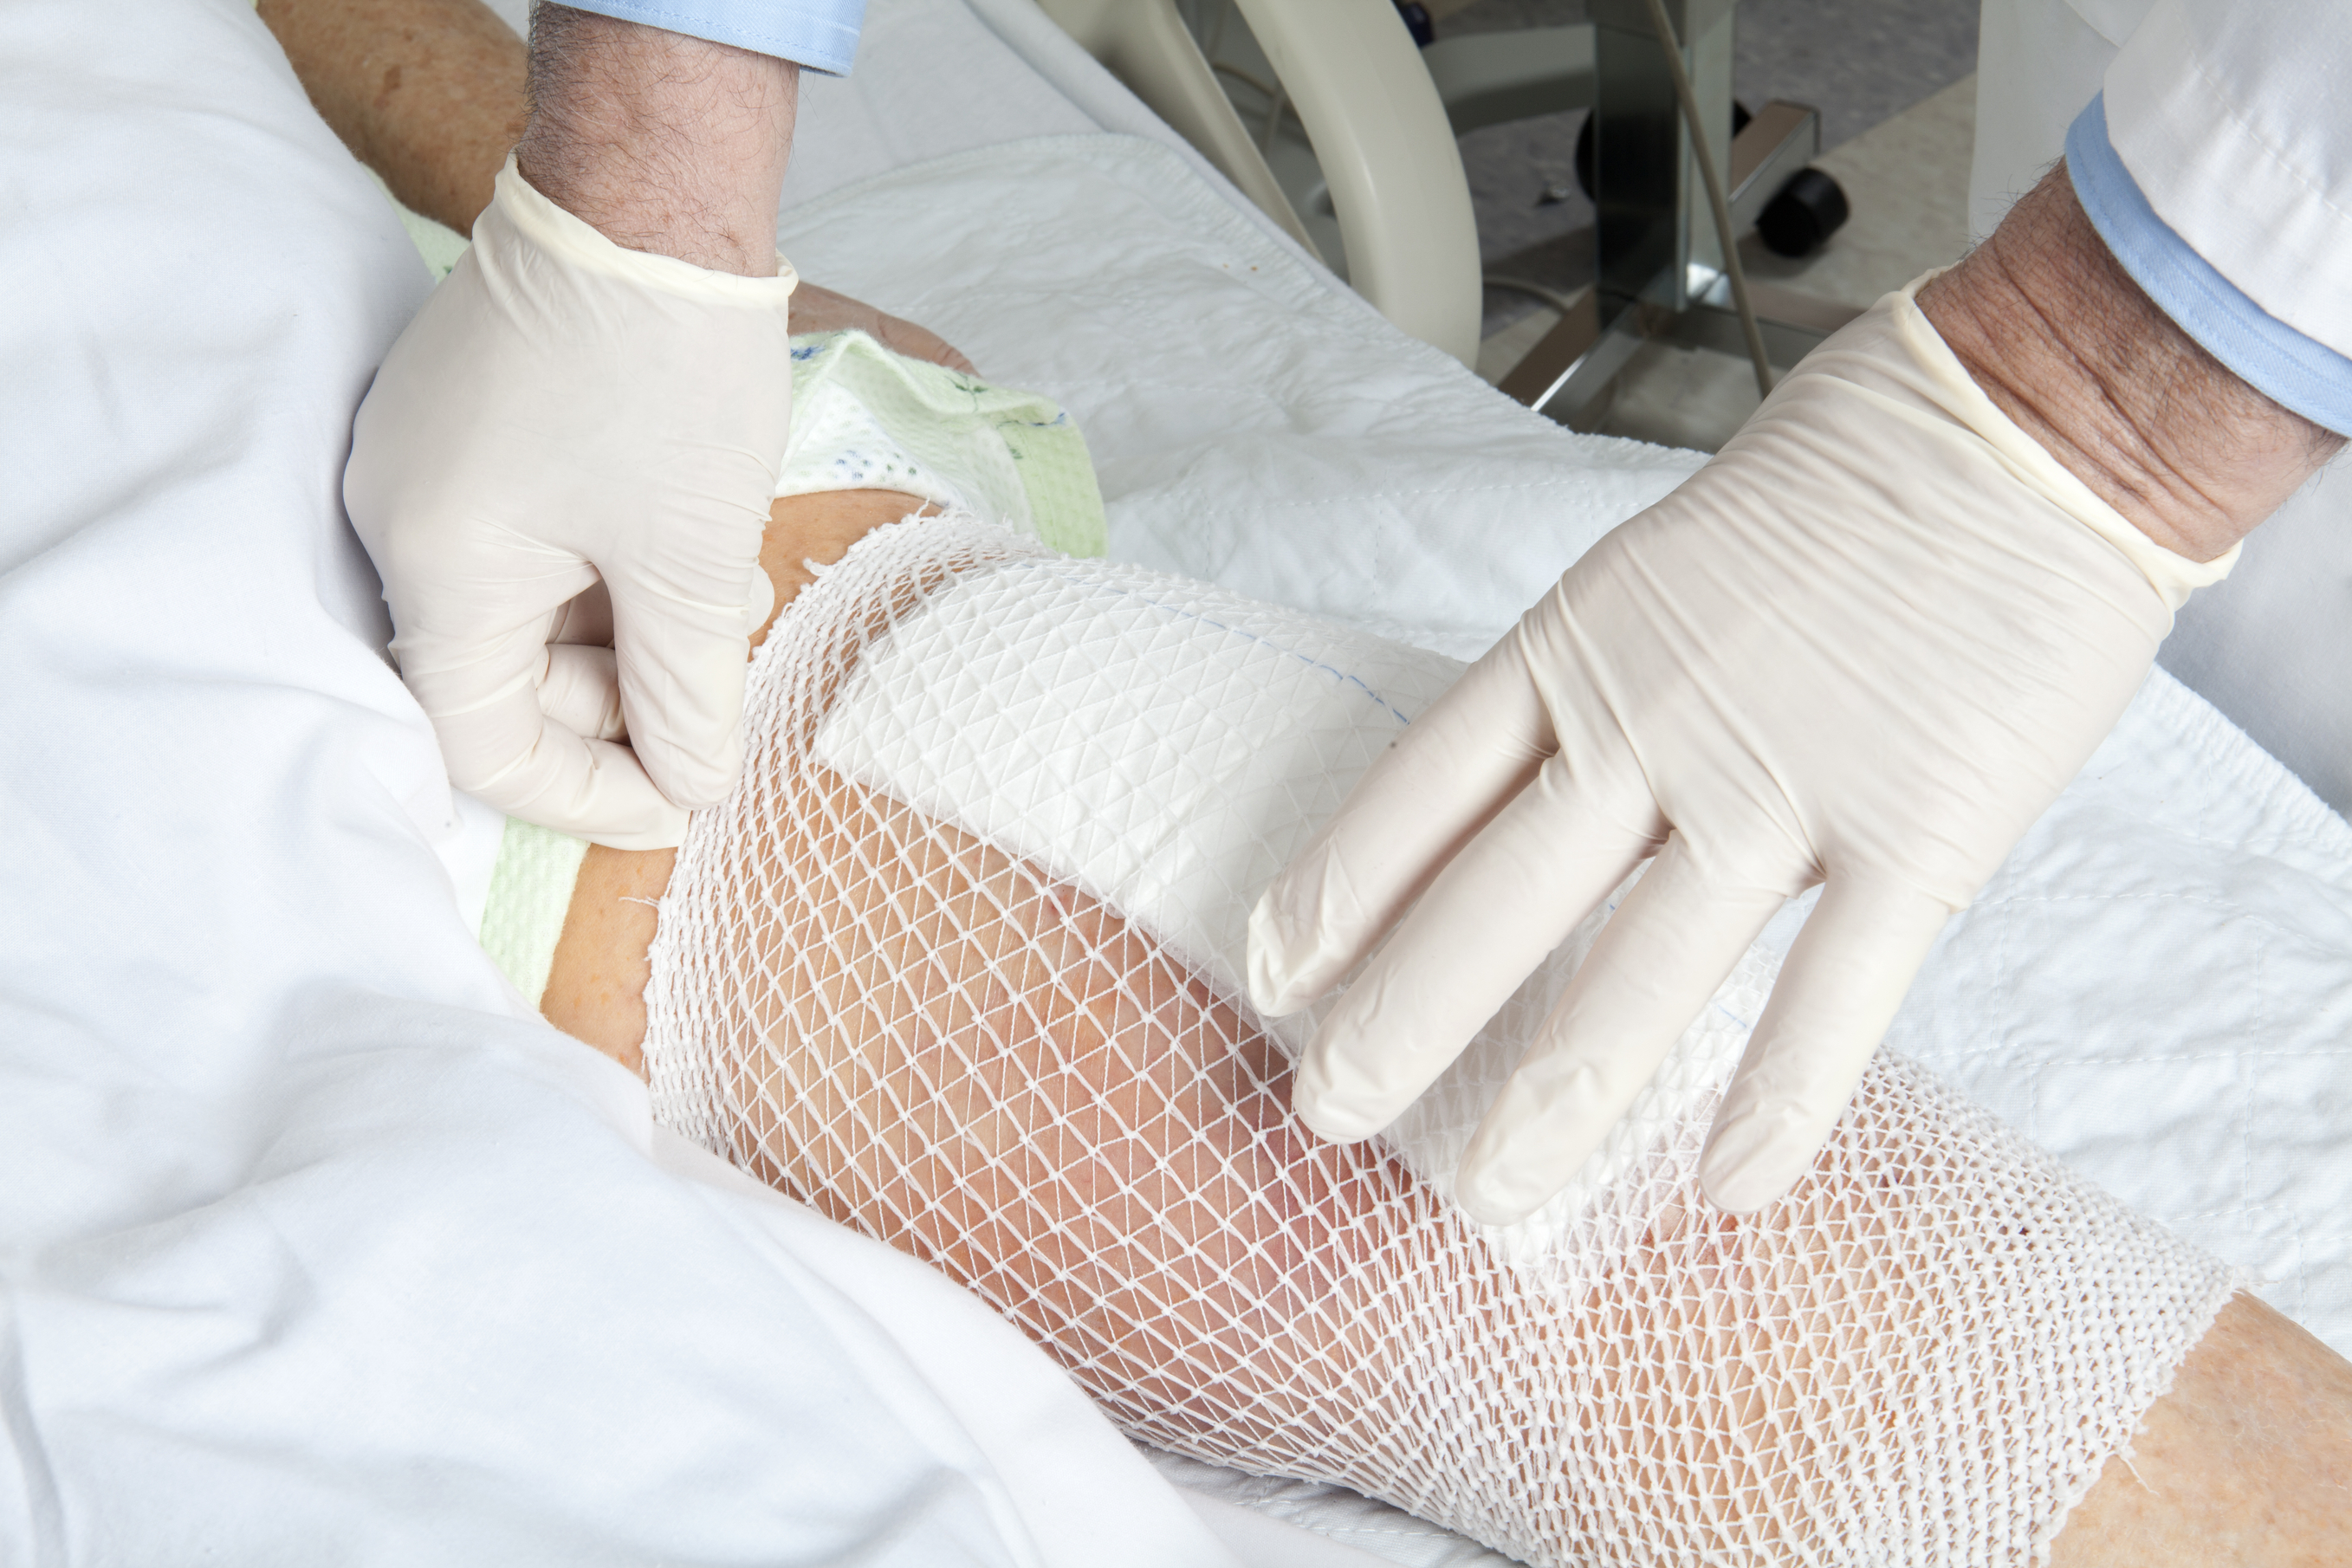 Zimmer NexGen Knee Lawsuits: Now the Good News — North